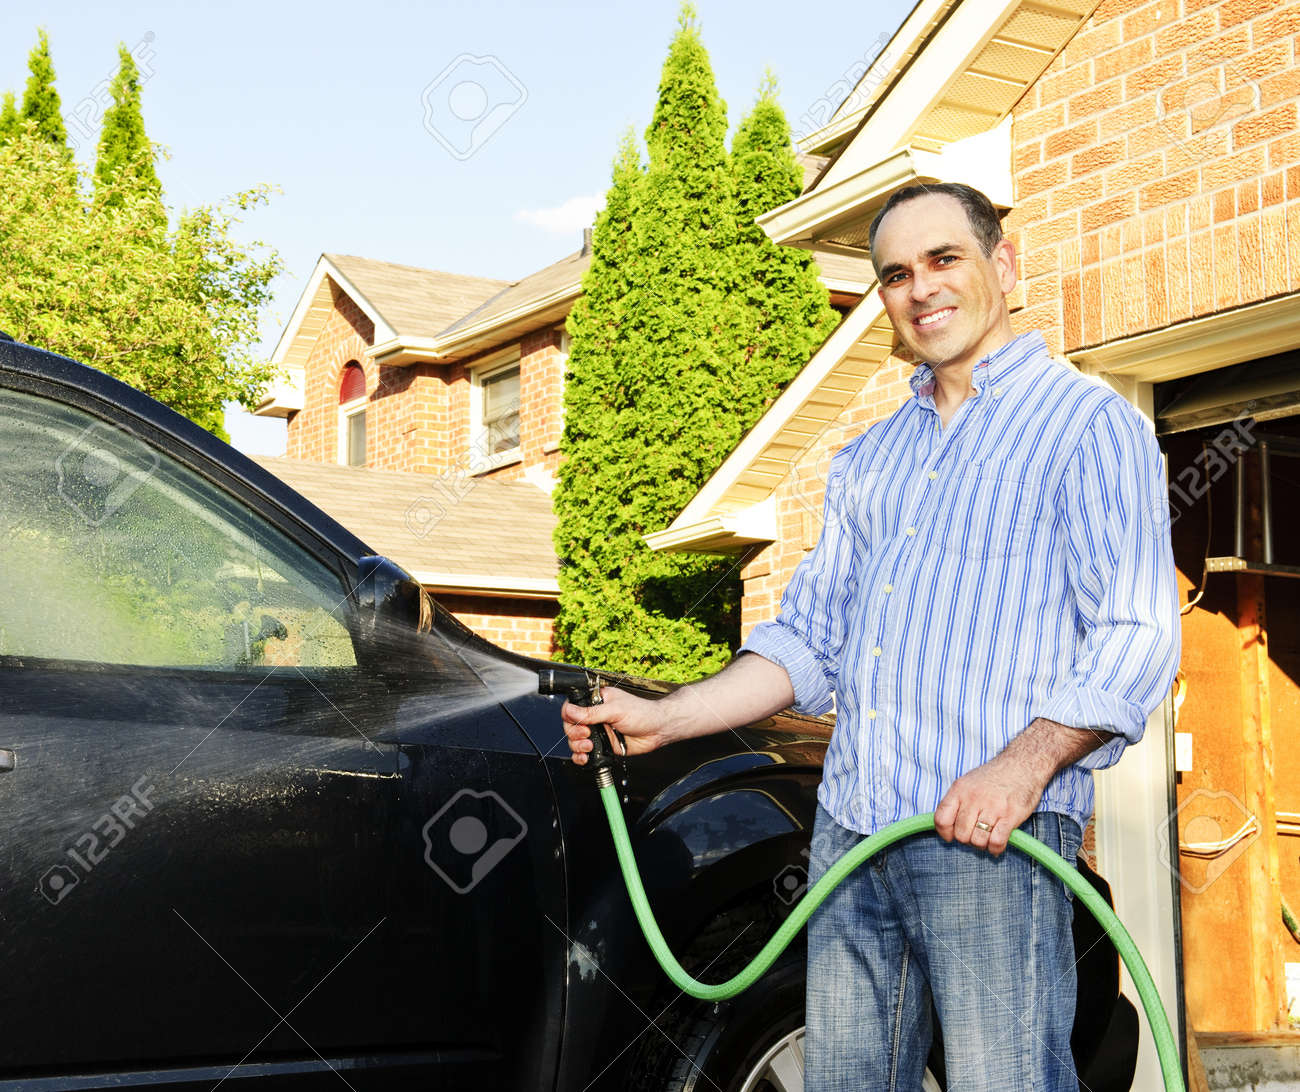 Man washing his car on the driveway Stock Photo - 7372968